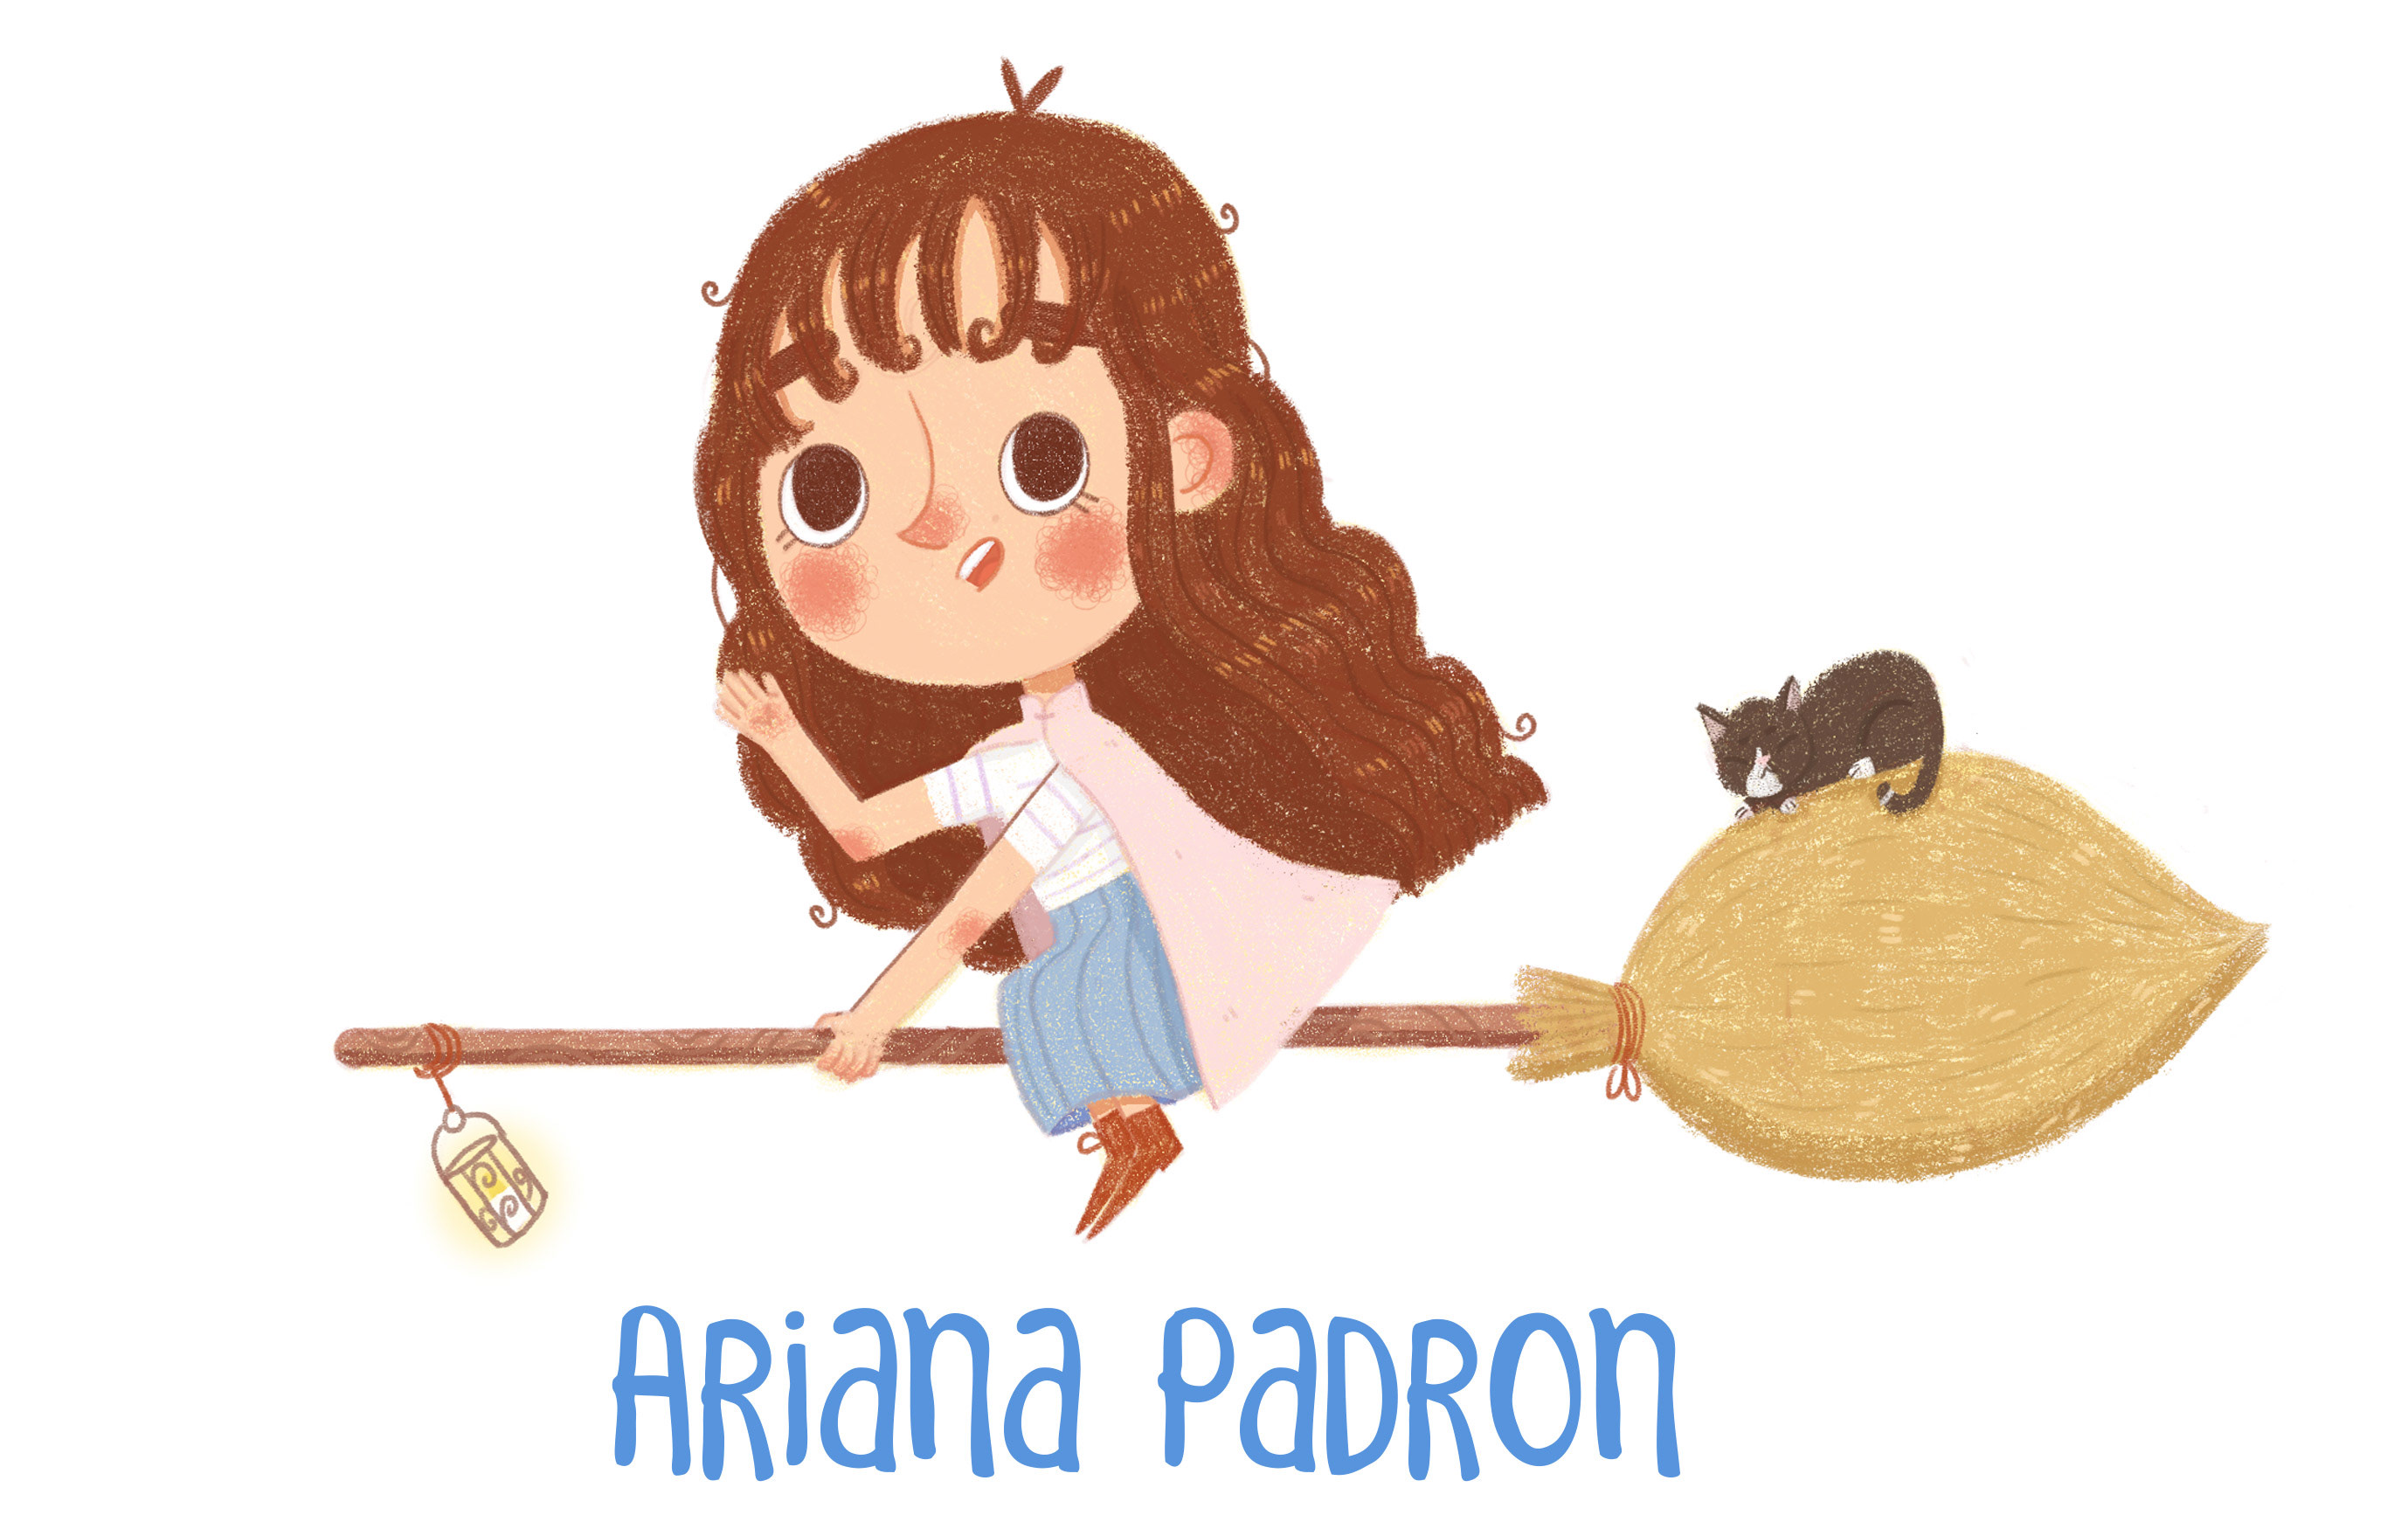 Ariana Padron